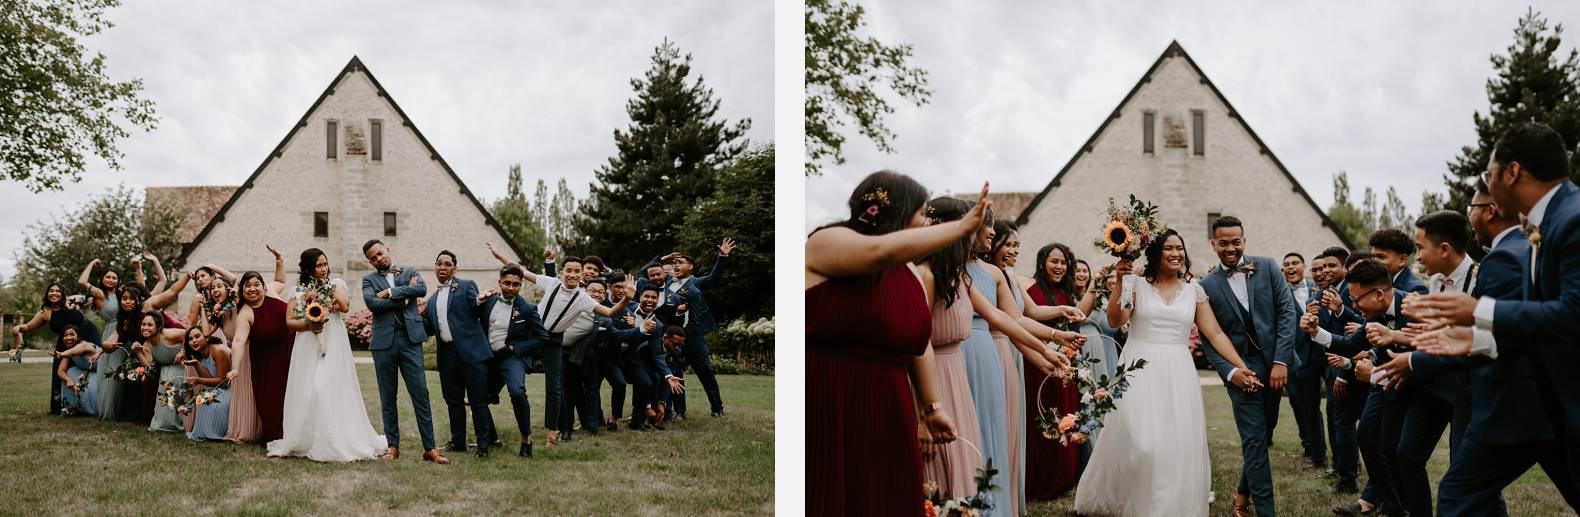 mariage manoir de corny photographe bel esprit 0047 1